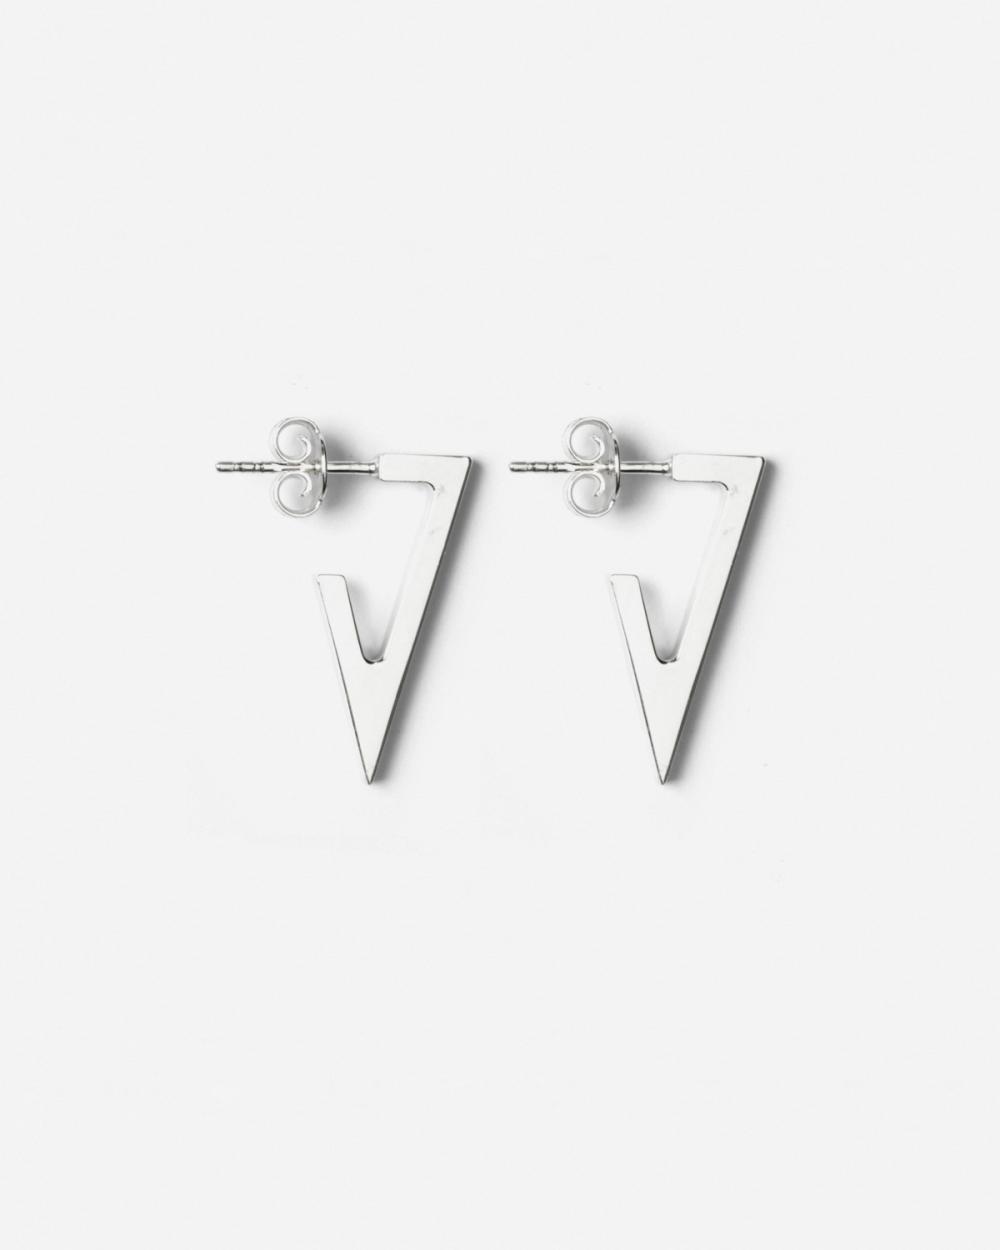 Earrings SILVER TRIANGULAR PLATE SMALL EARRINGS NOVE25